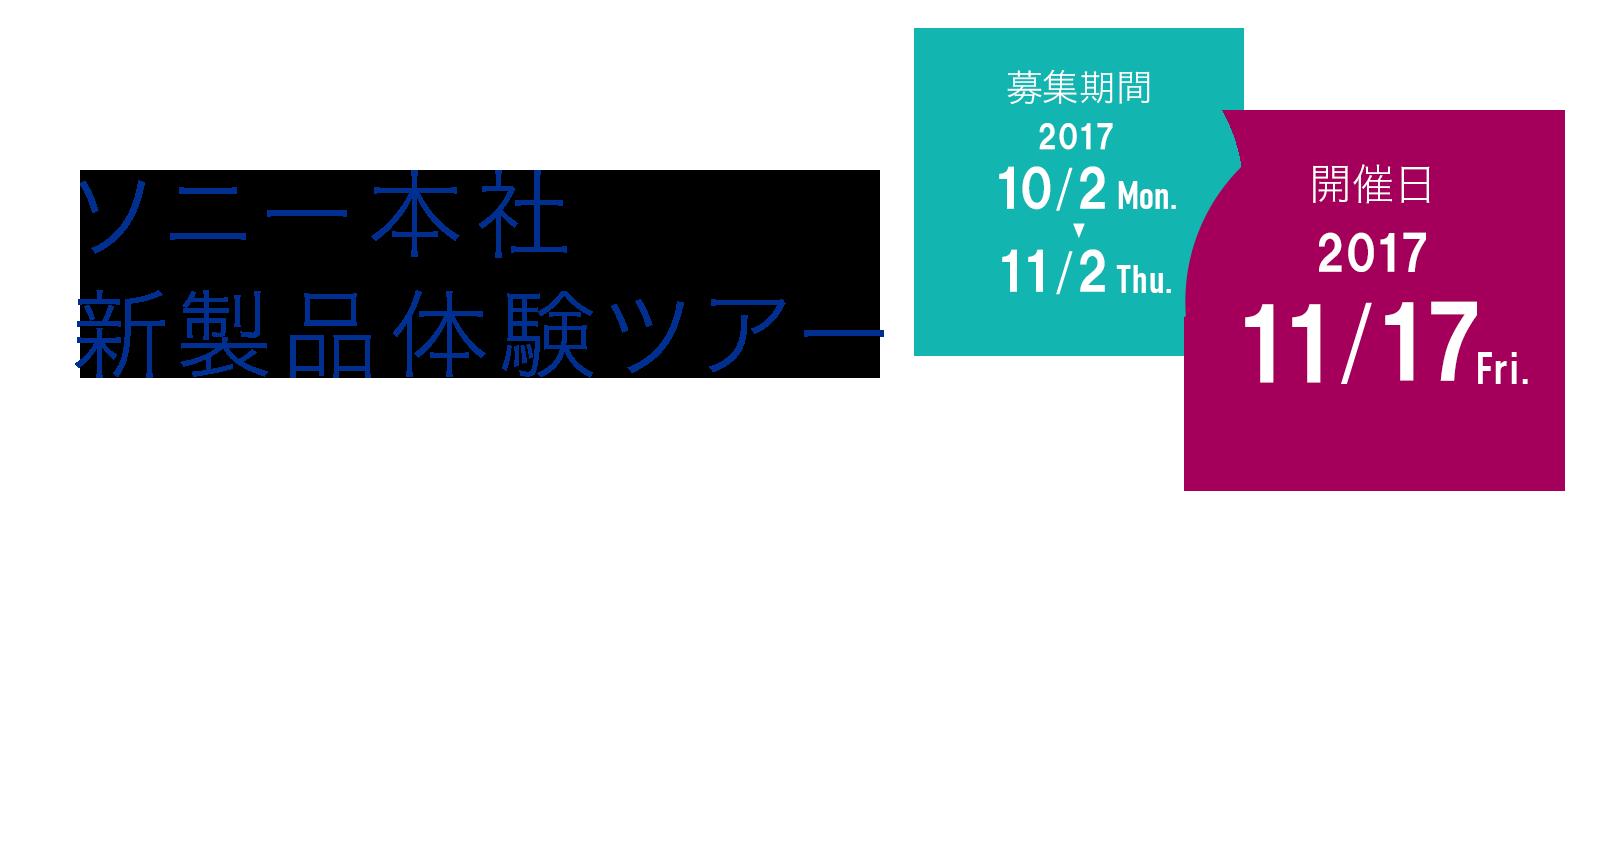 ソニー本社新製品体験ツアー 募集期間:2017年10月2日(月)〜 11月2日(木) 開催日時:2017年11月17日(金)